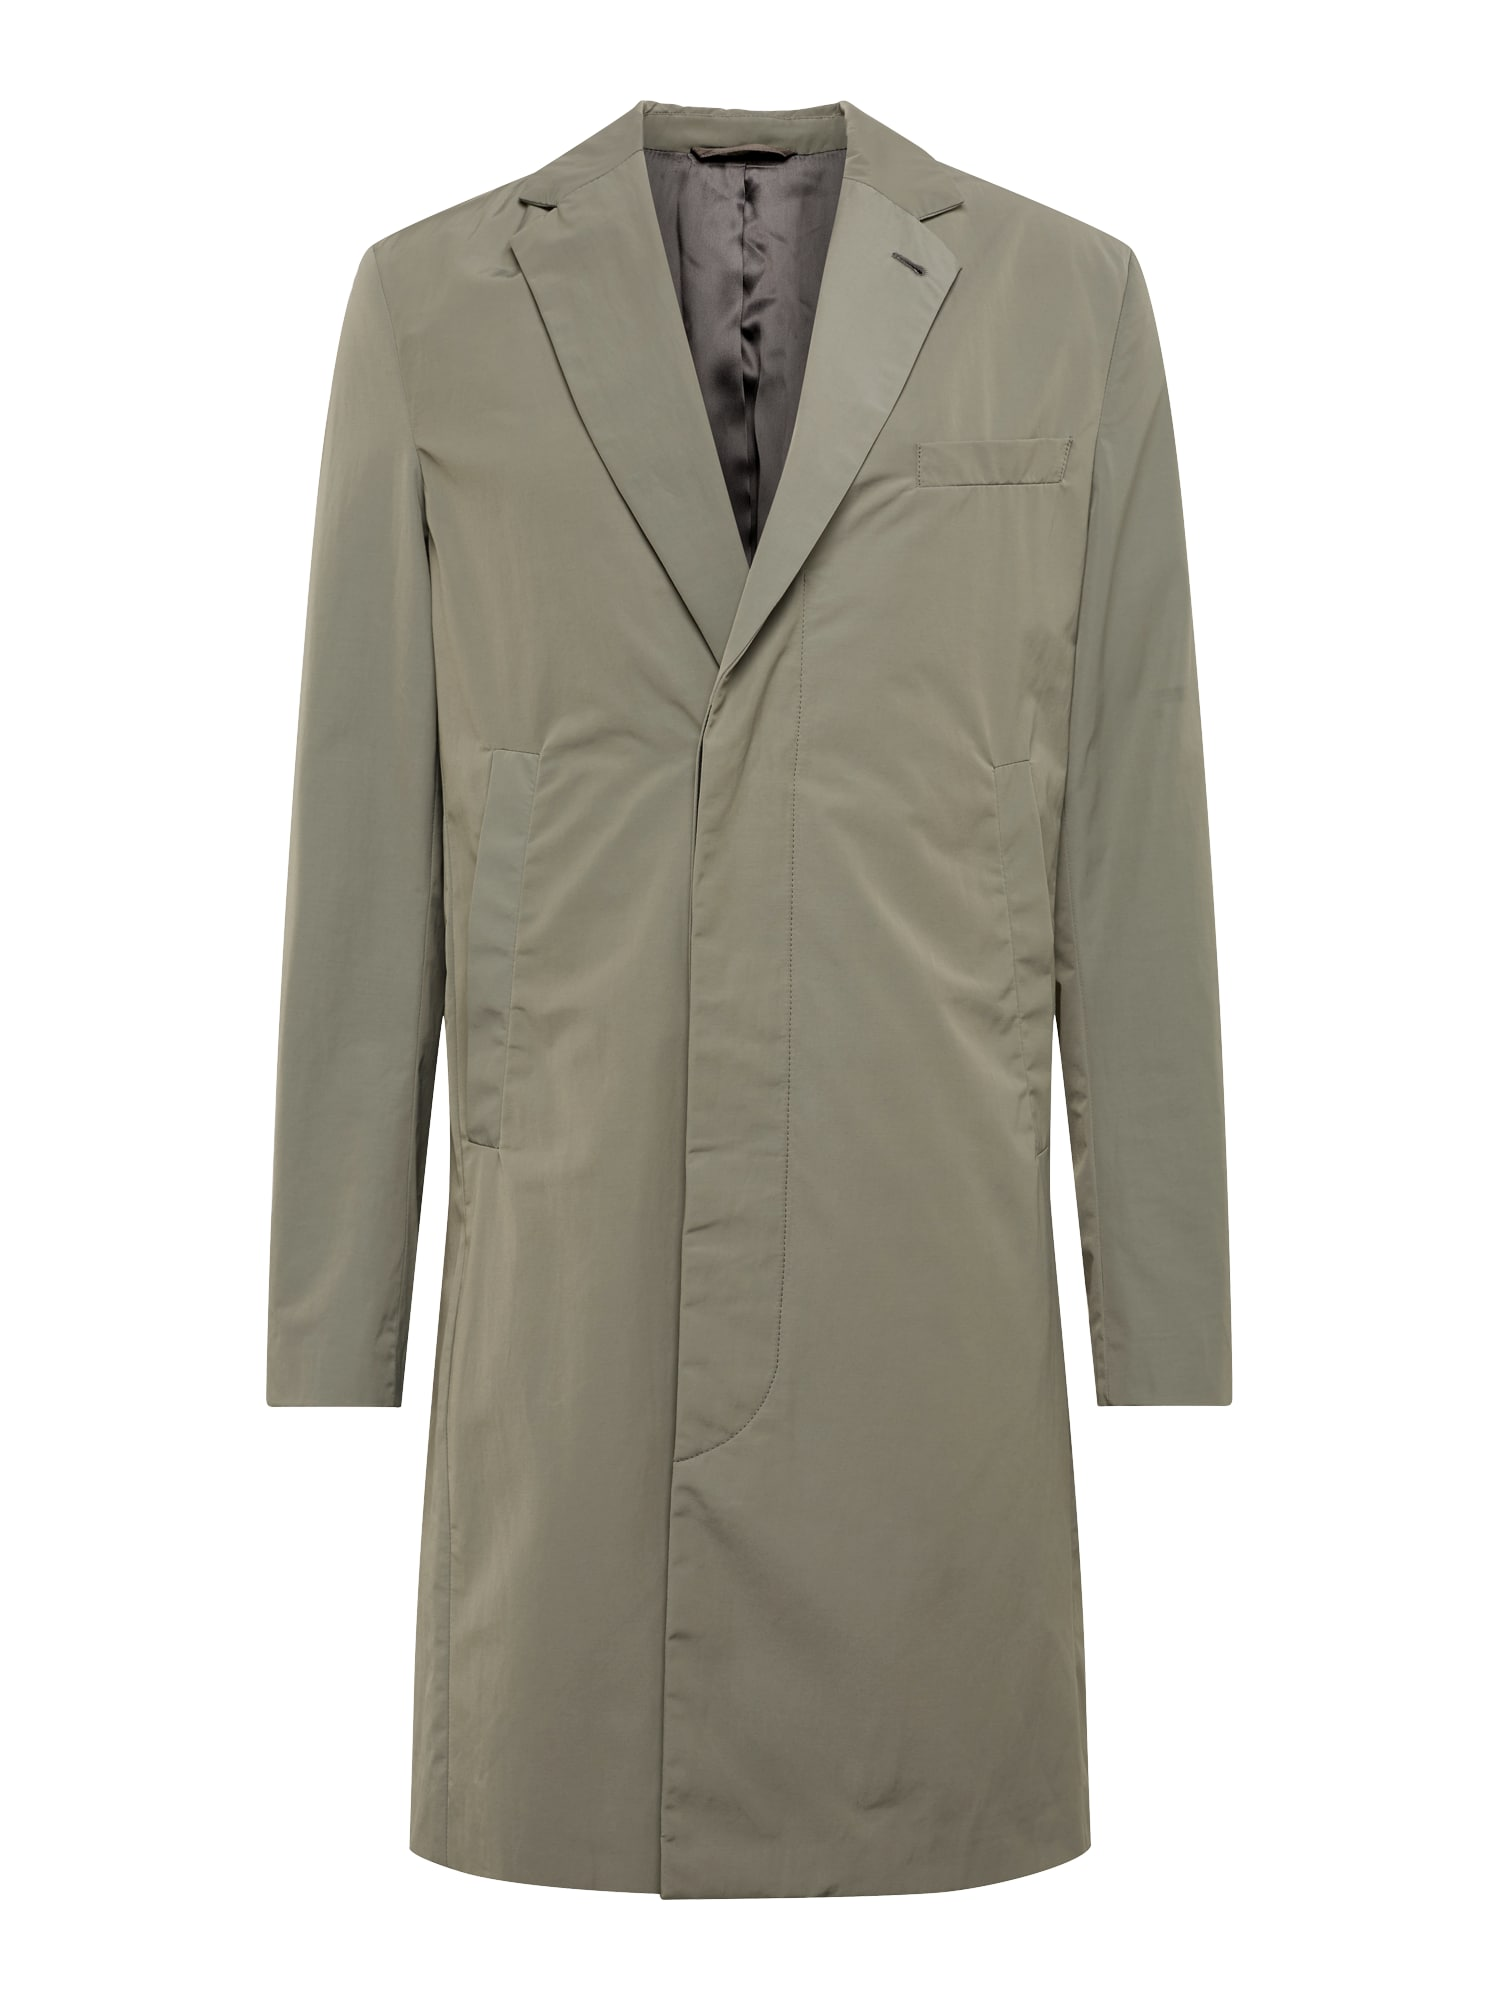 Filippa K Rudeninis-žieminis paltas 'M. Ross Spring Coat' alyvuogių spalva